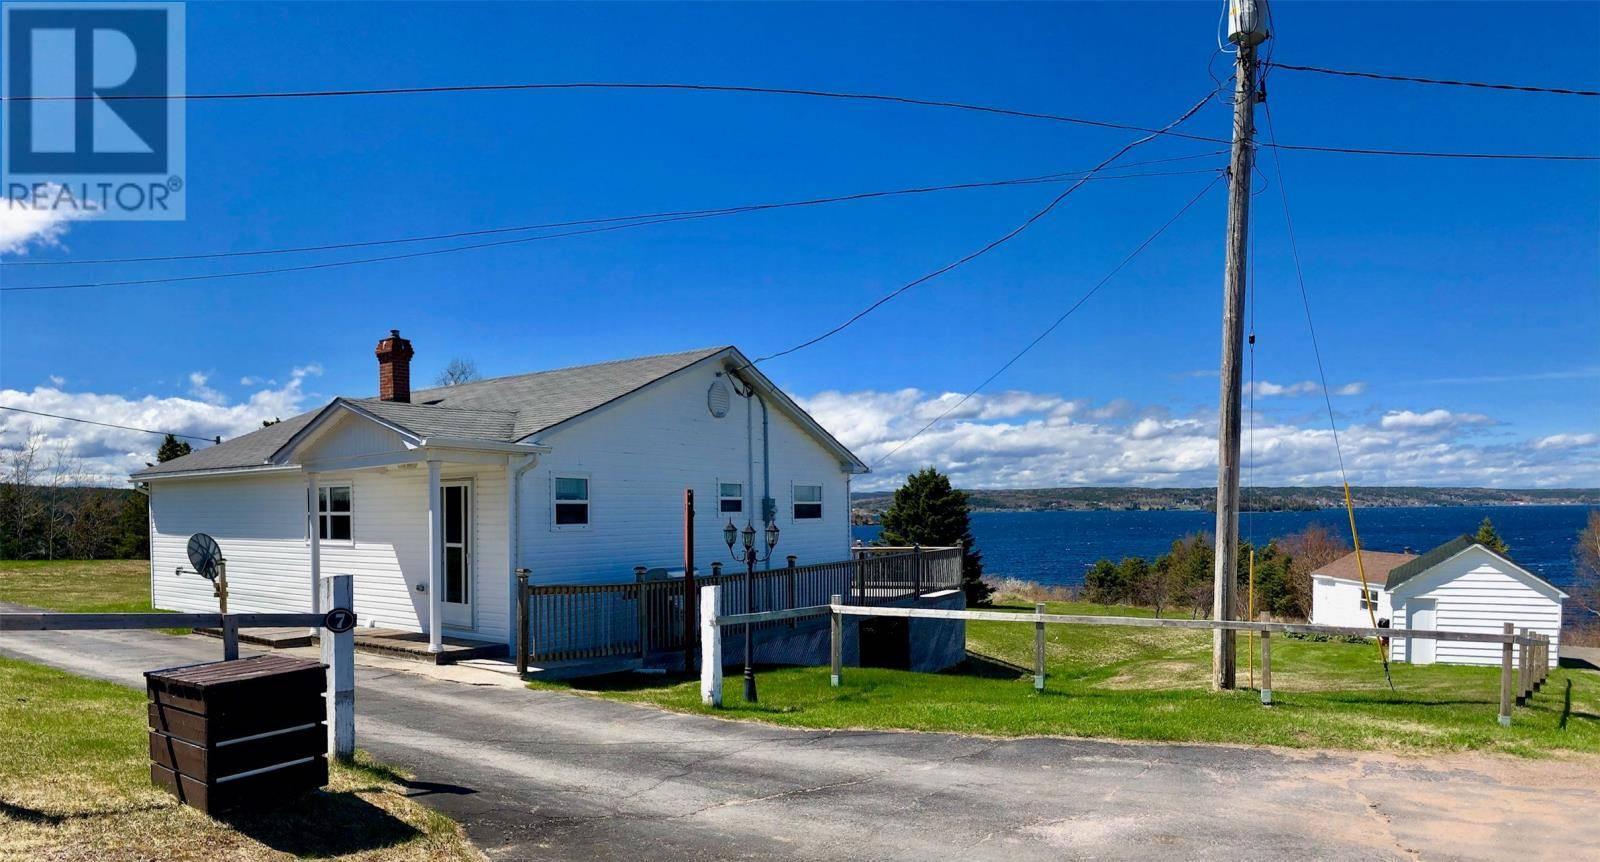 House for sale at 7 Holloways Pl Lethbridge Newfoundland - MLS: 1196976